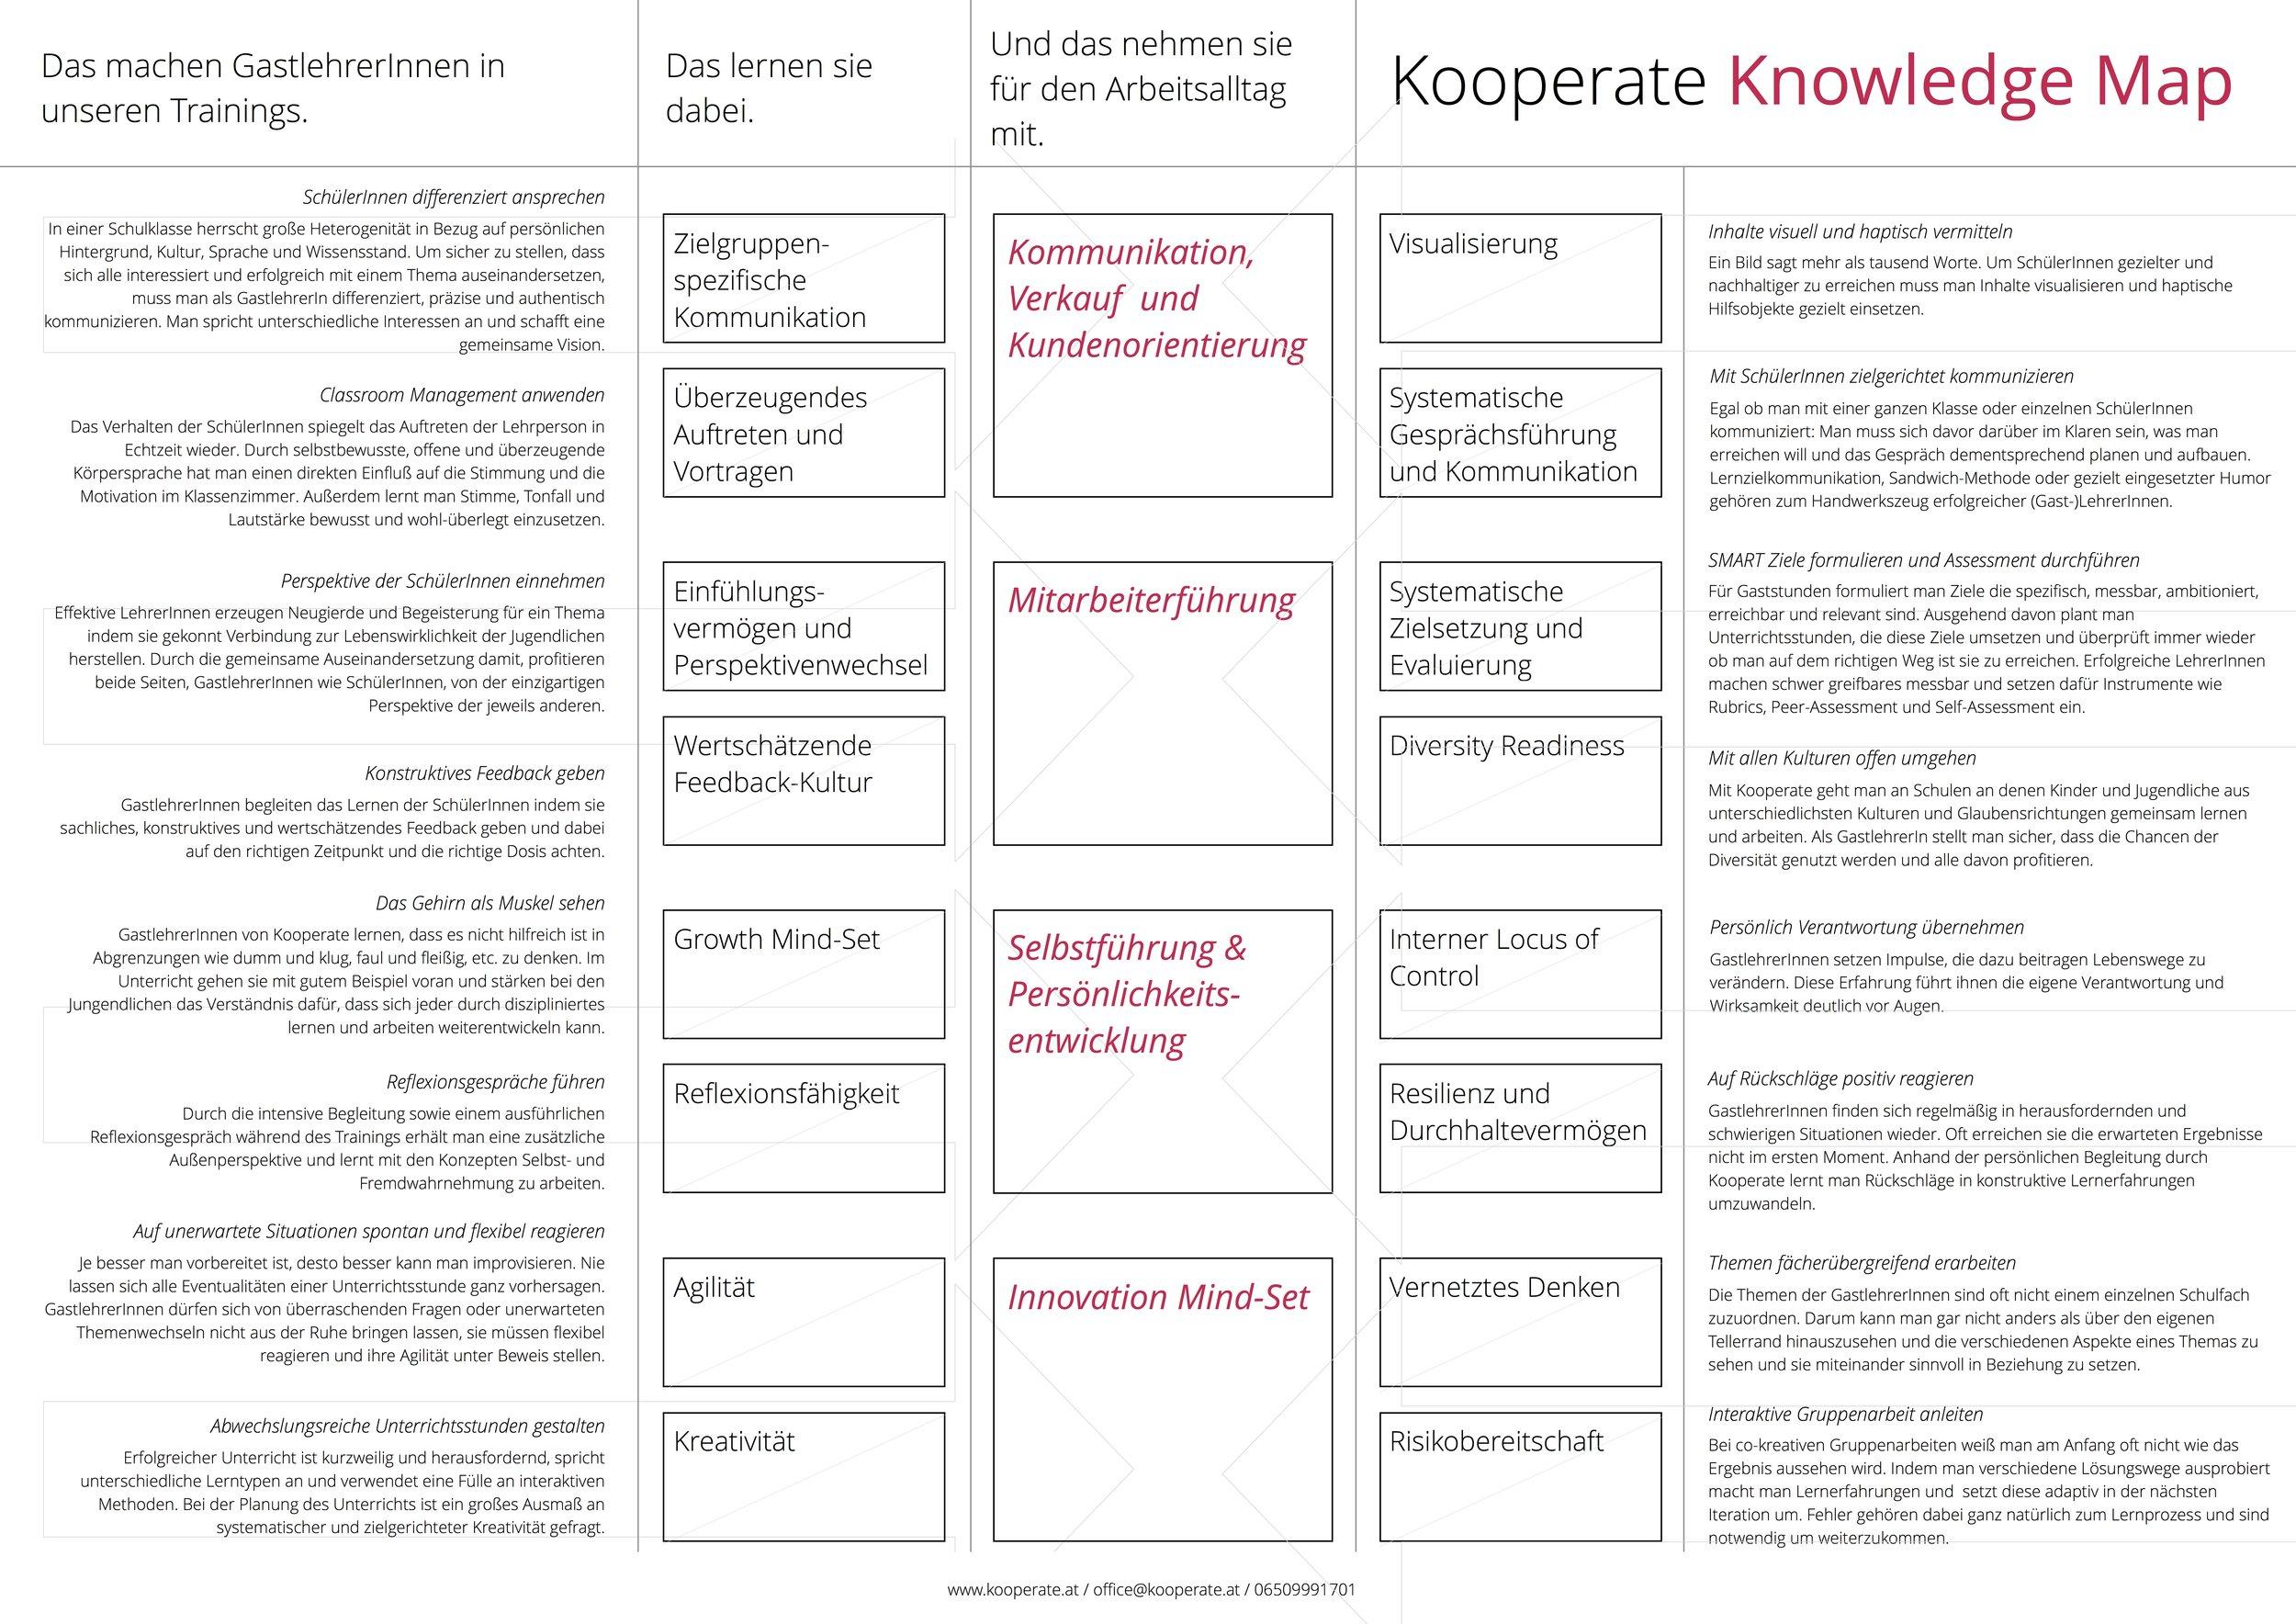 KooperateKnowledgeMap_072017.jpg